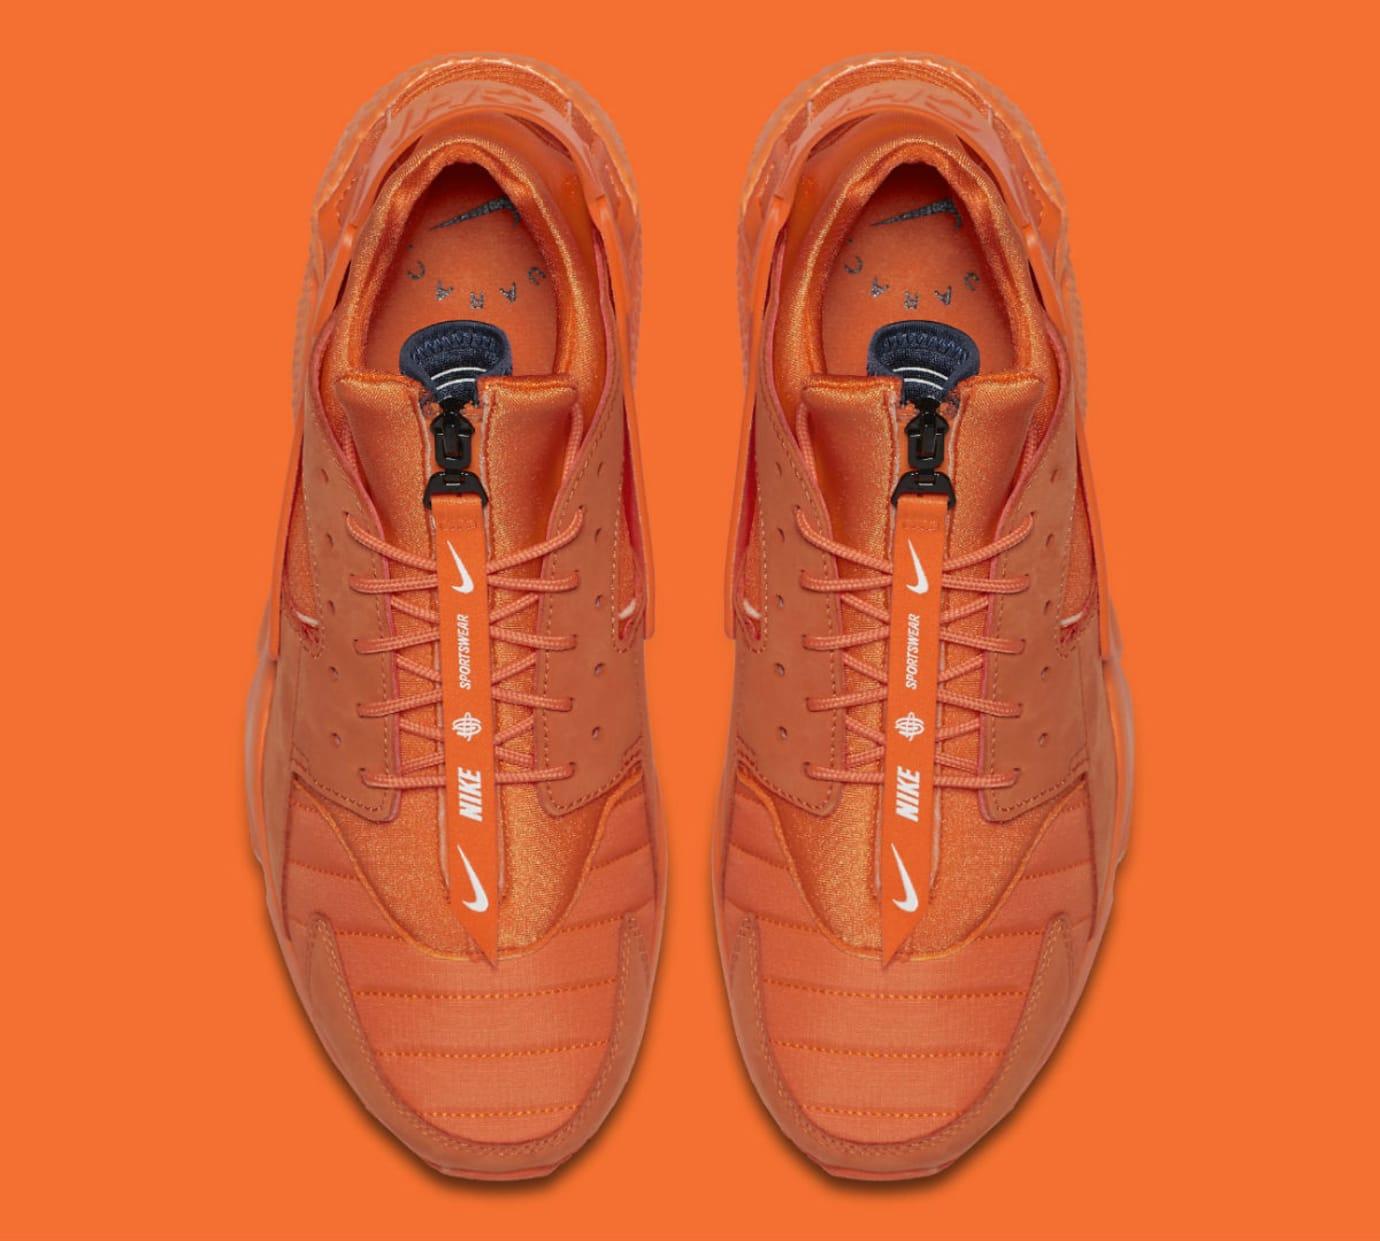 3791c42ec8ff9 Nike Air Huarache Run Chicago Orange Release Date AJ5578-800 Top